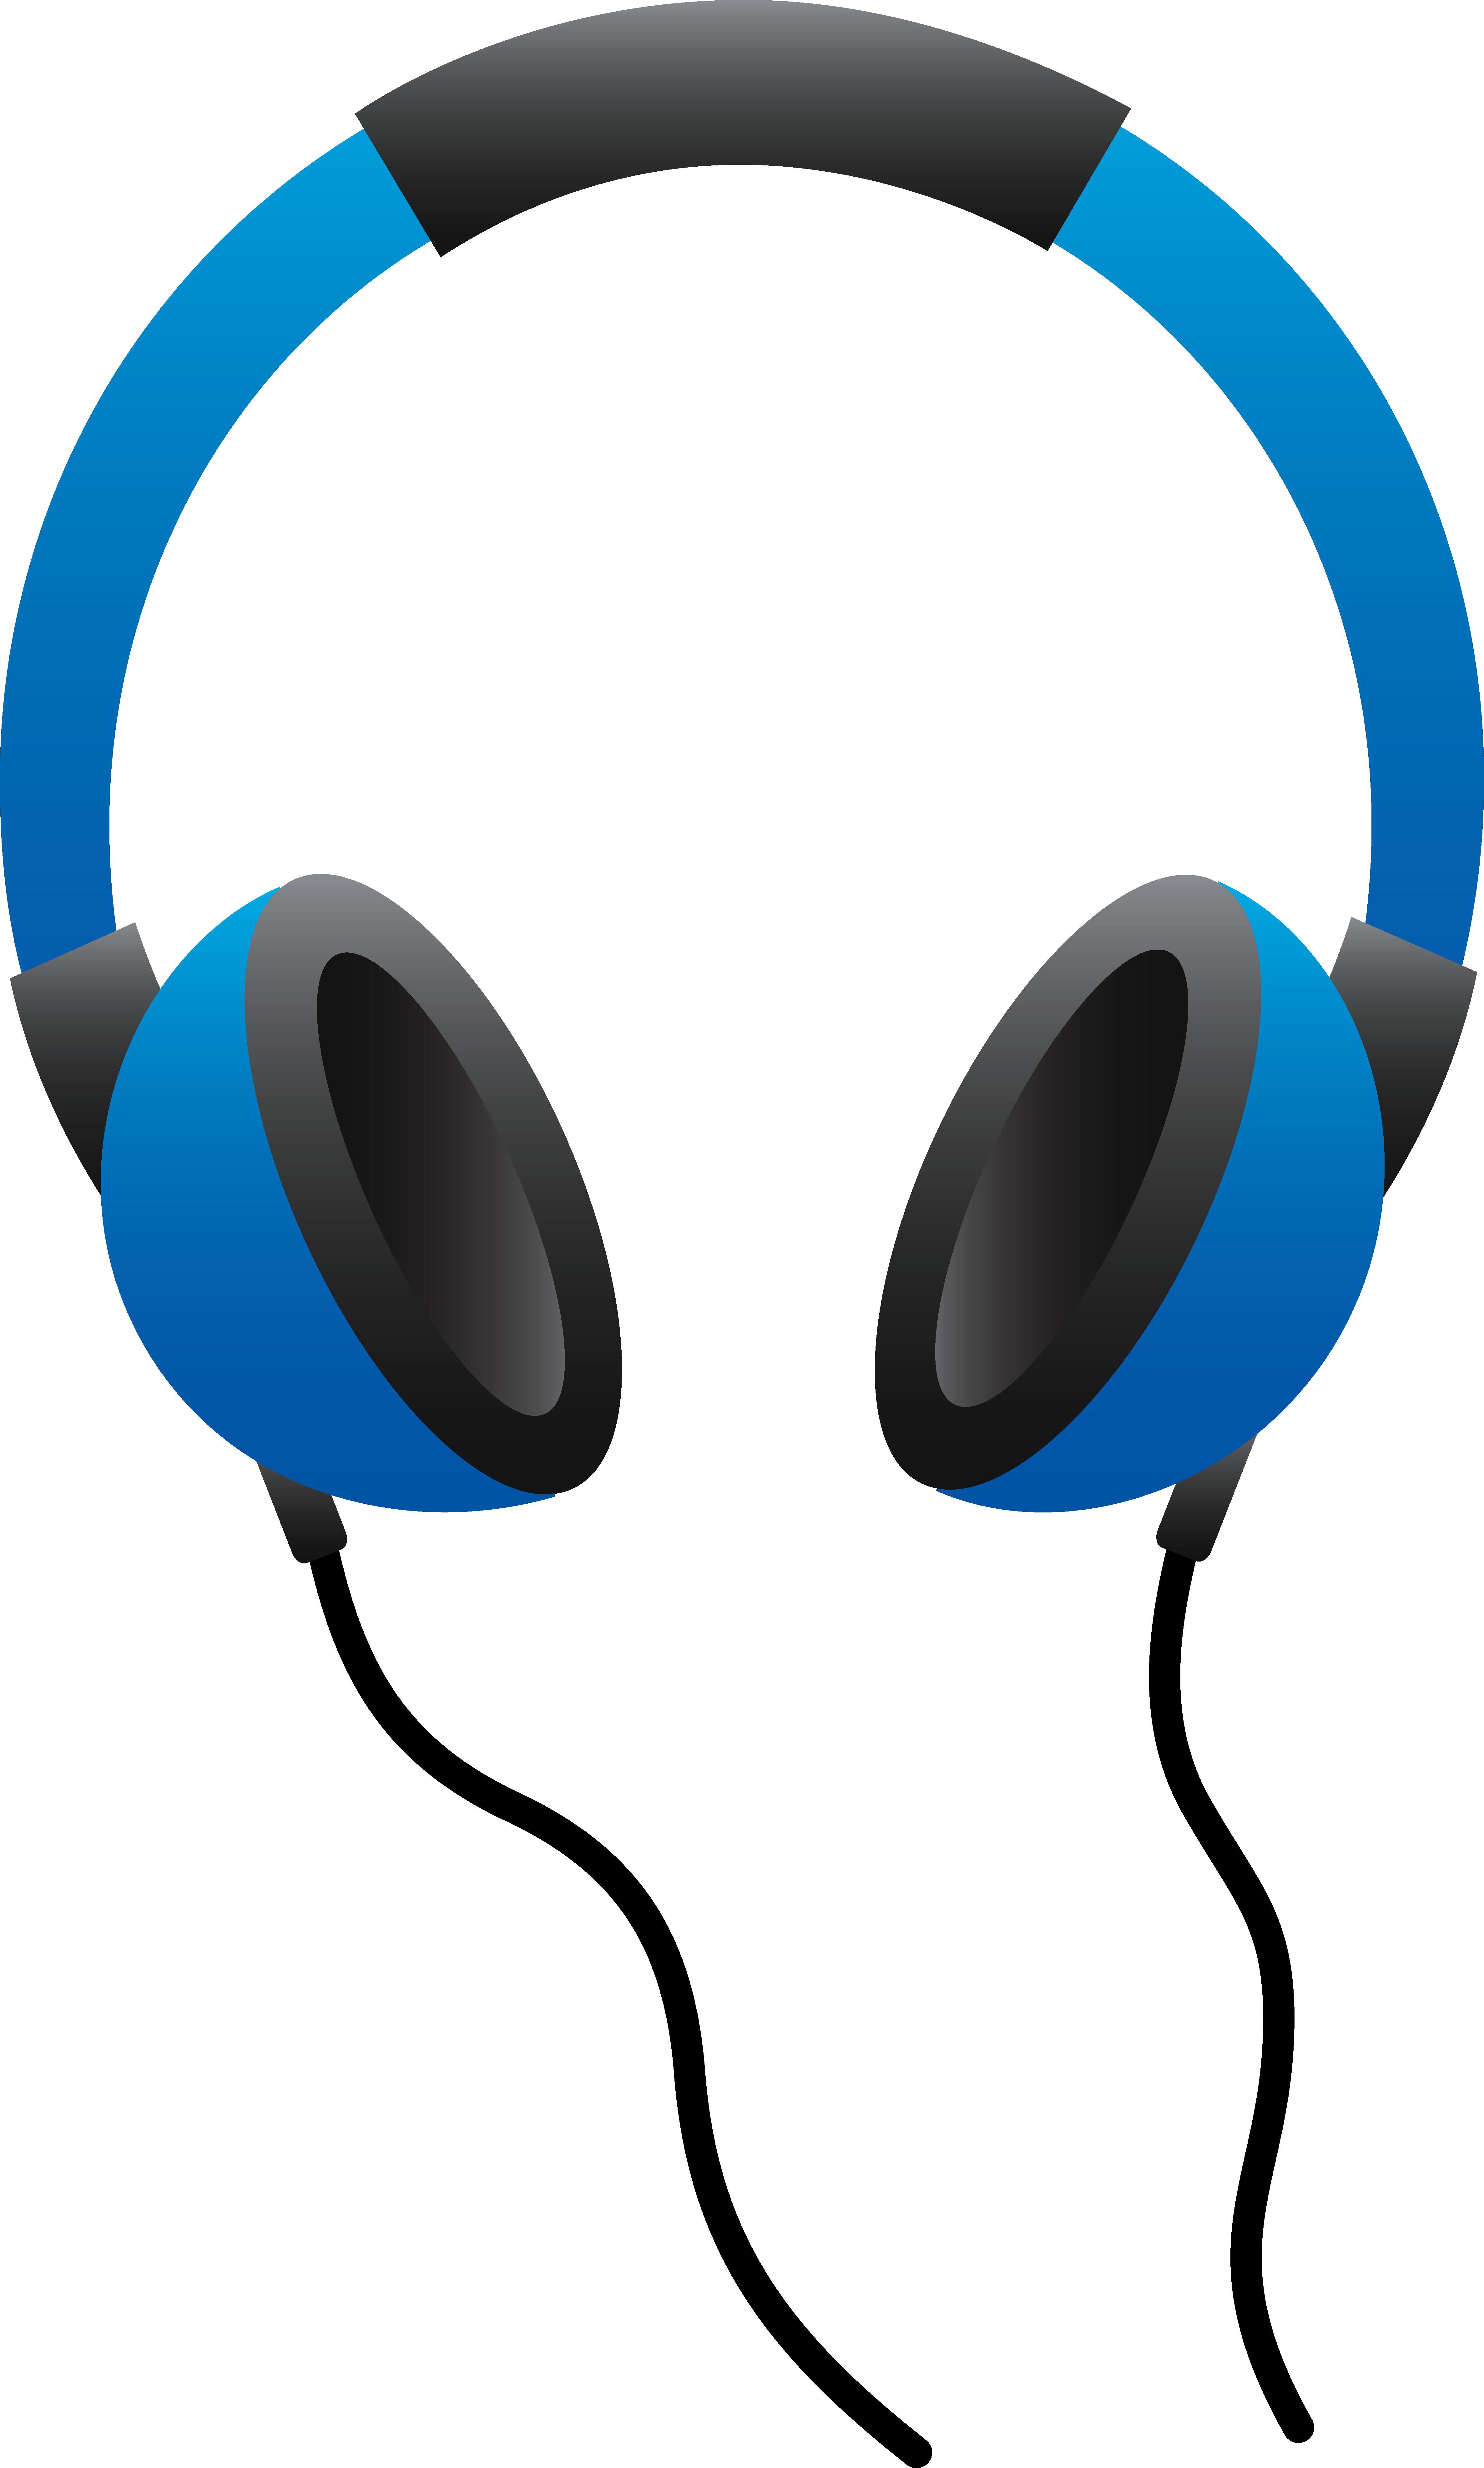 4746x7893 Blue Headphones